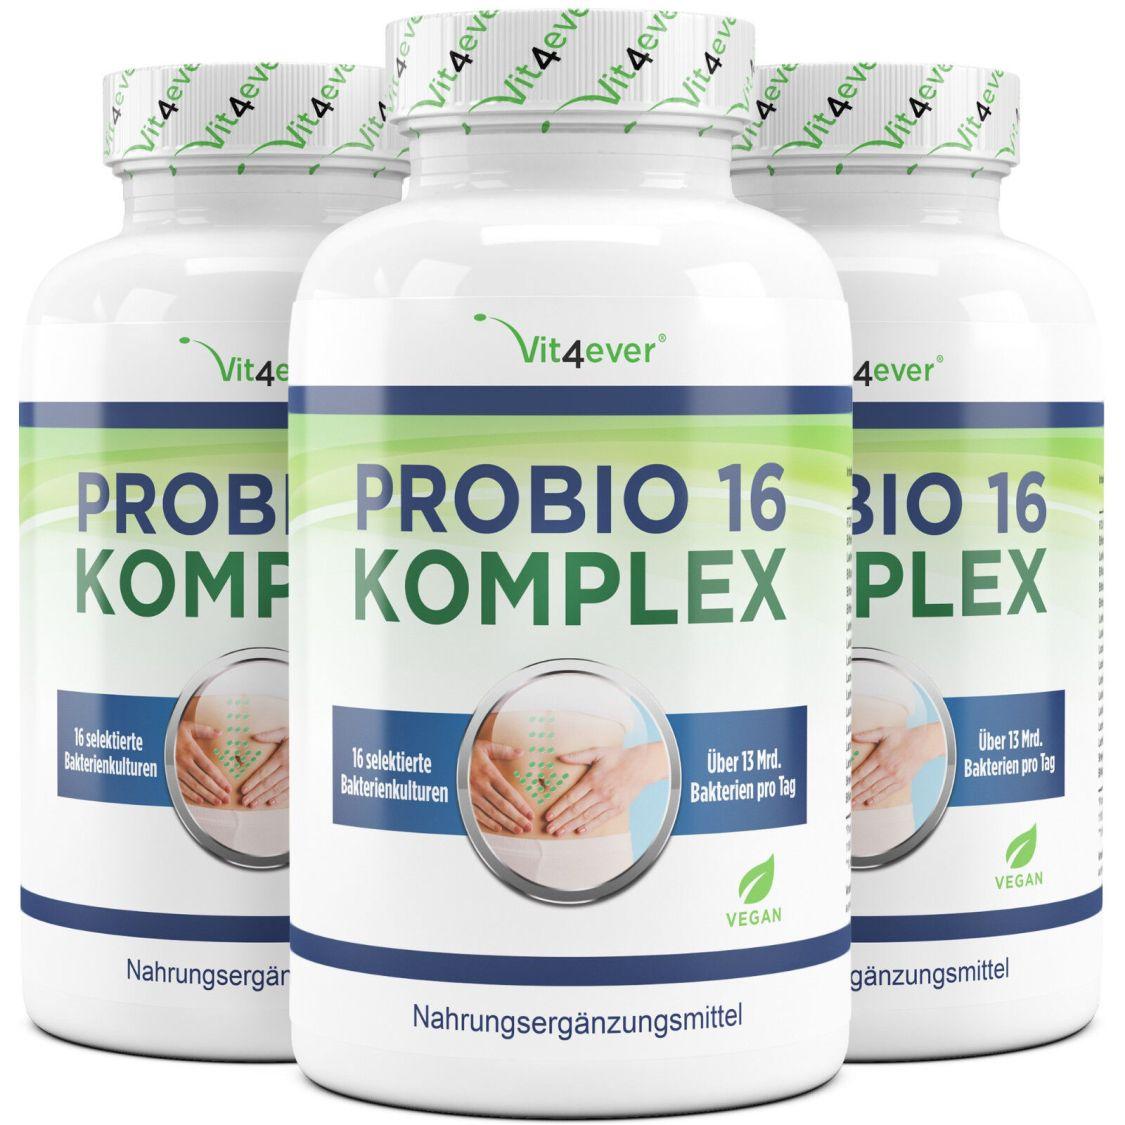 3x Probiotika Komplex = 360 Kapseln 13 Mrd. Bakterien 16 Bakterienstämme + FOS